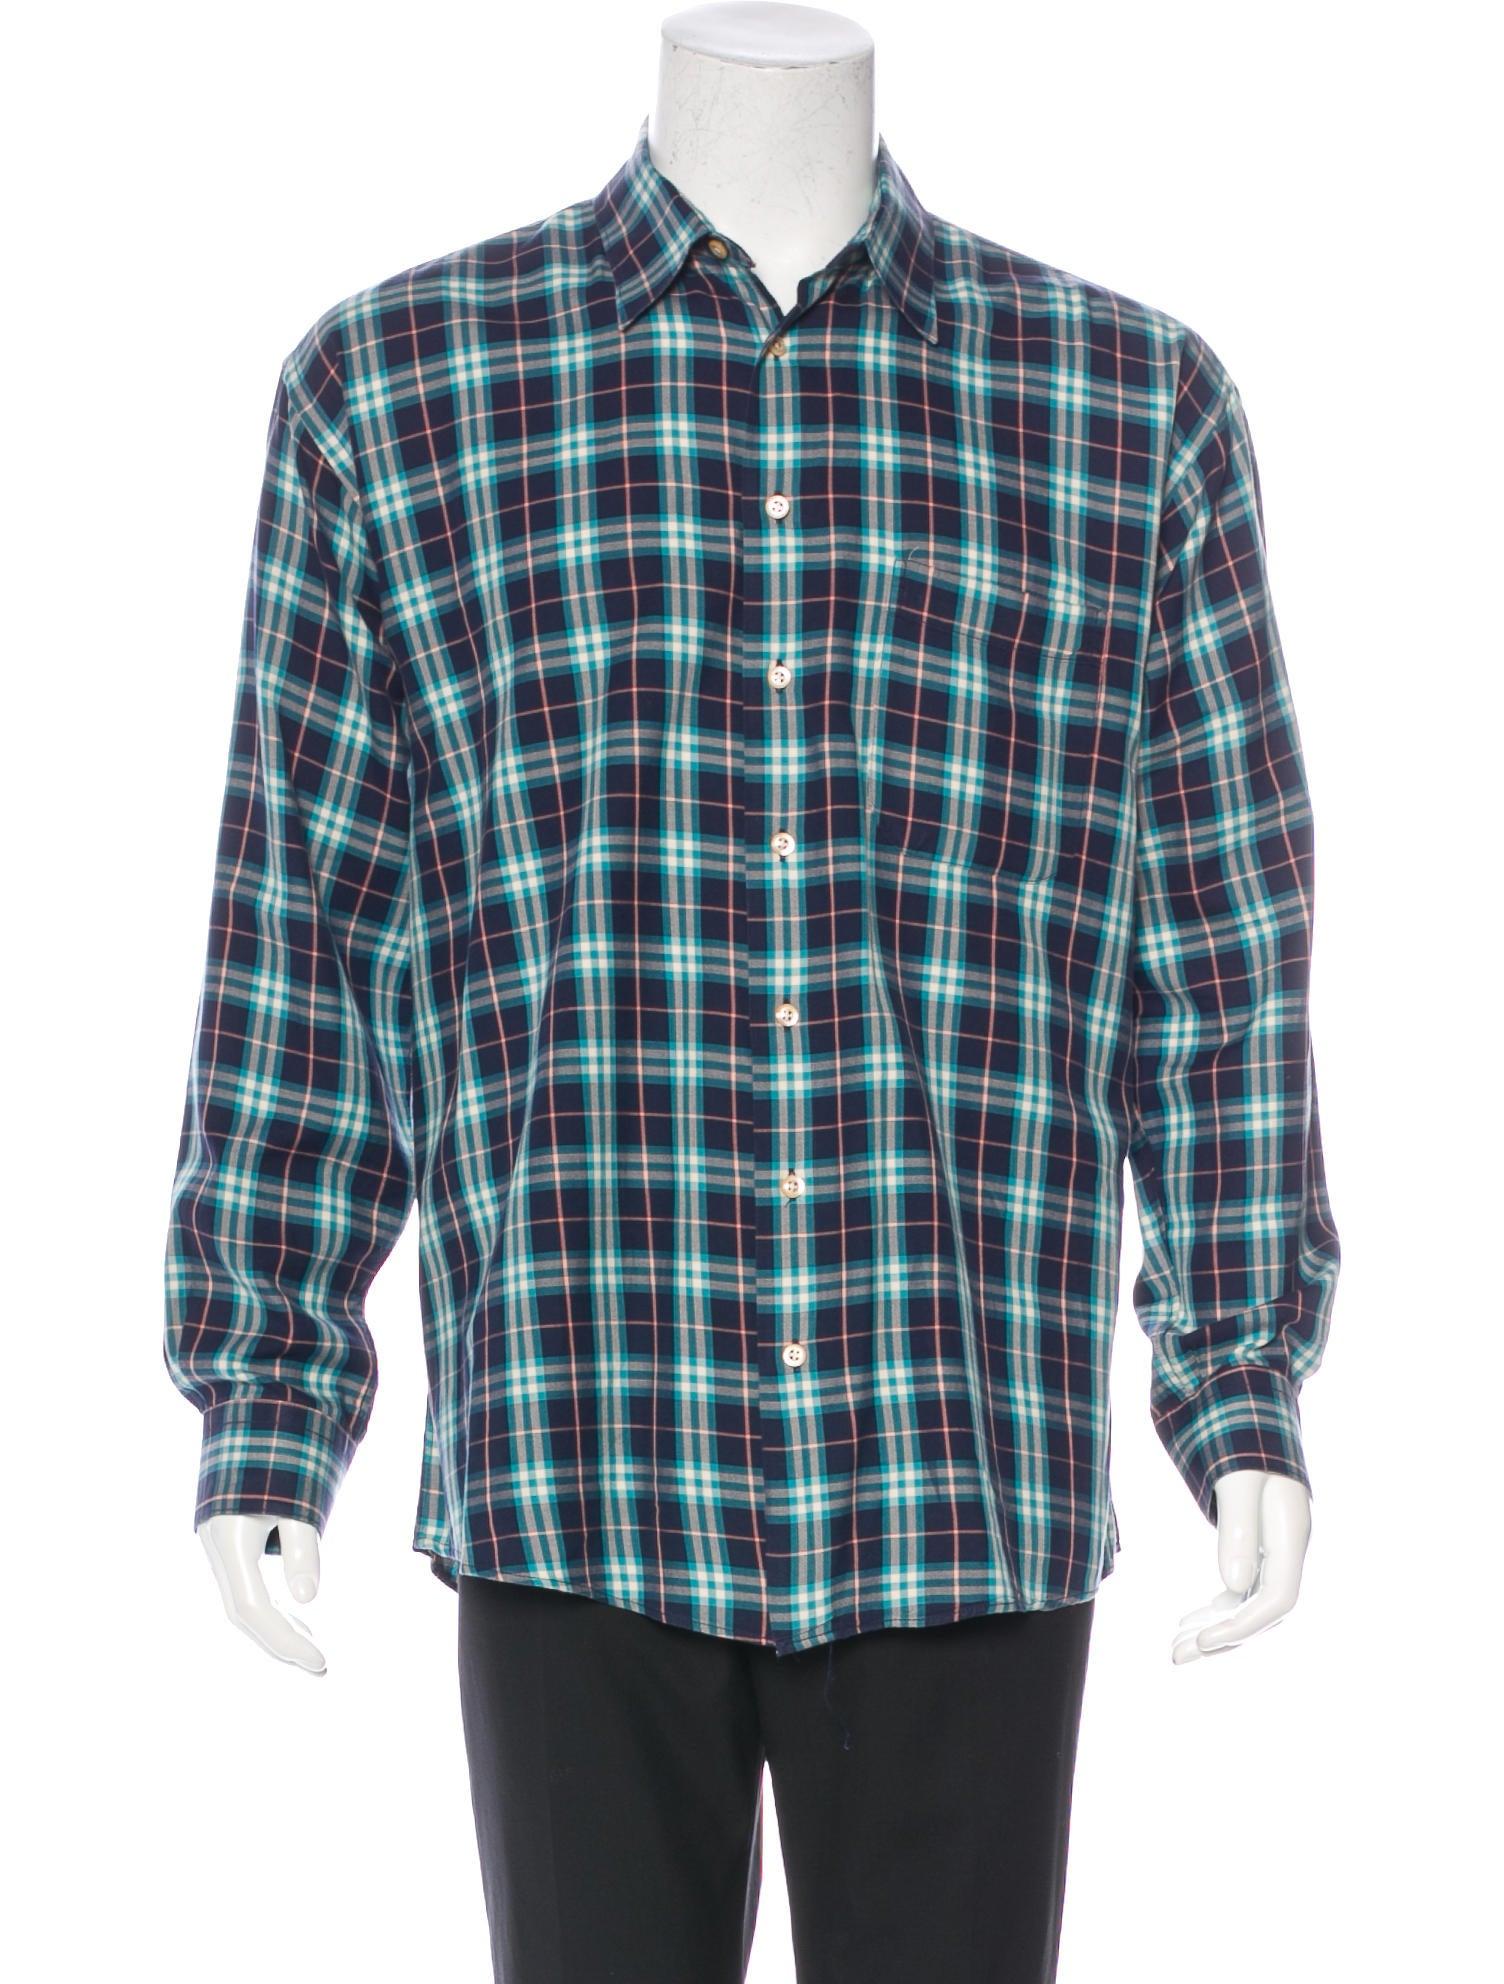 Burberry London Plaid Woven Shirt Clothing Wburl23748